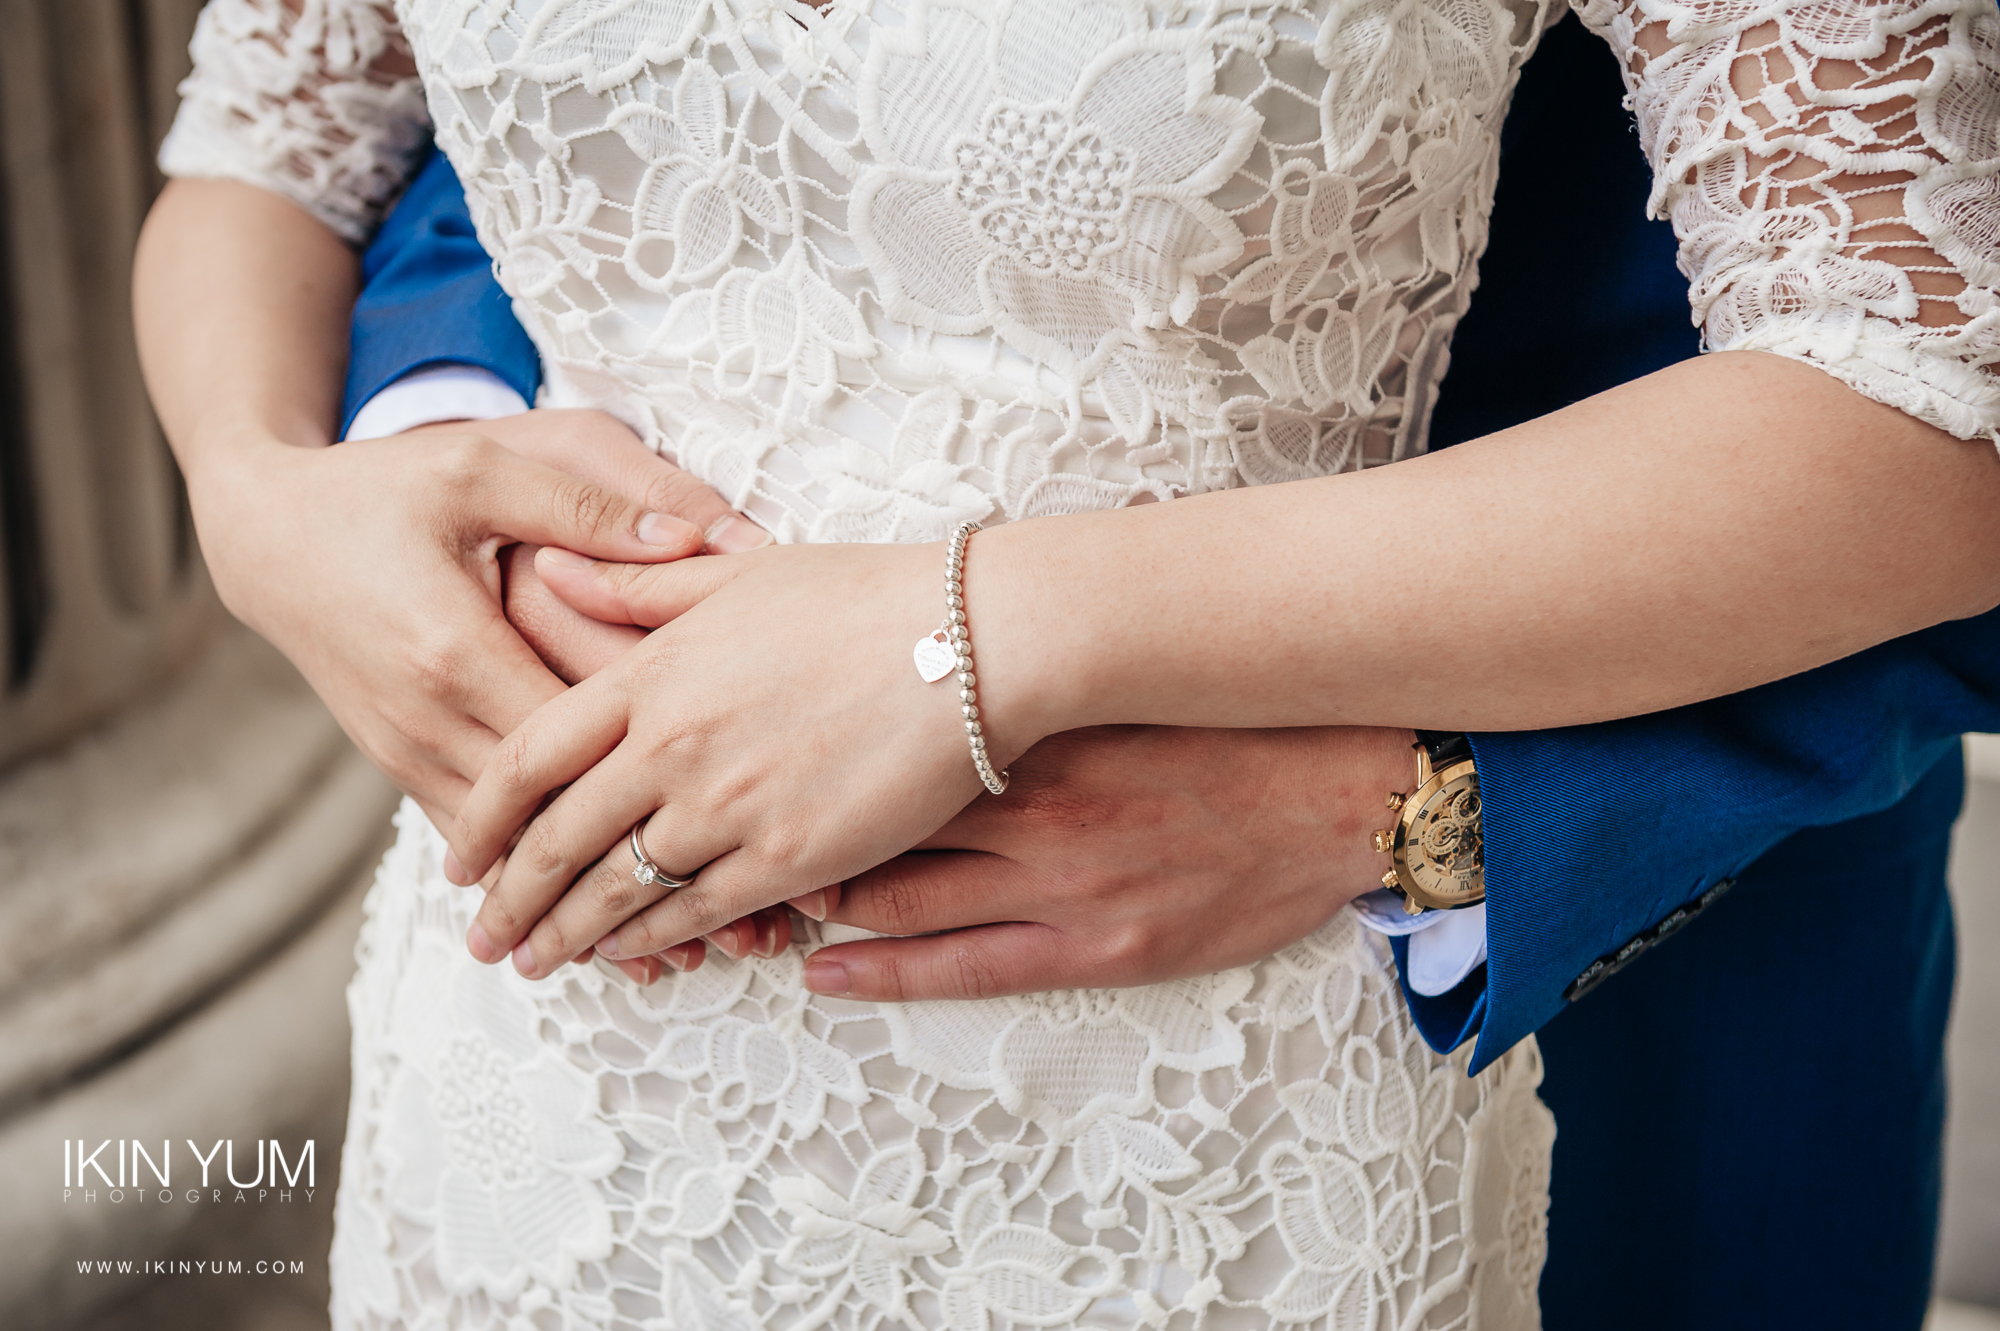 Natalie & Duncan Wedding Day - Ikin Yum Photography-125.jpg